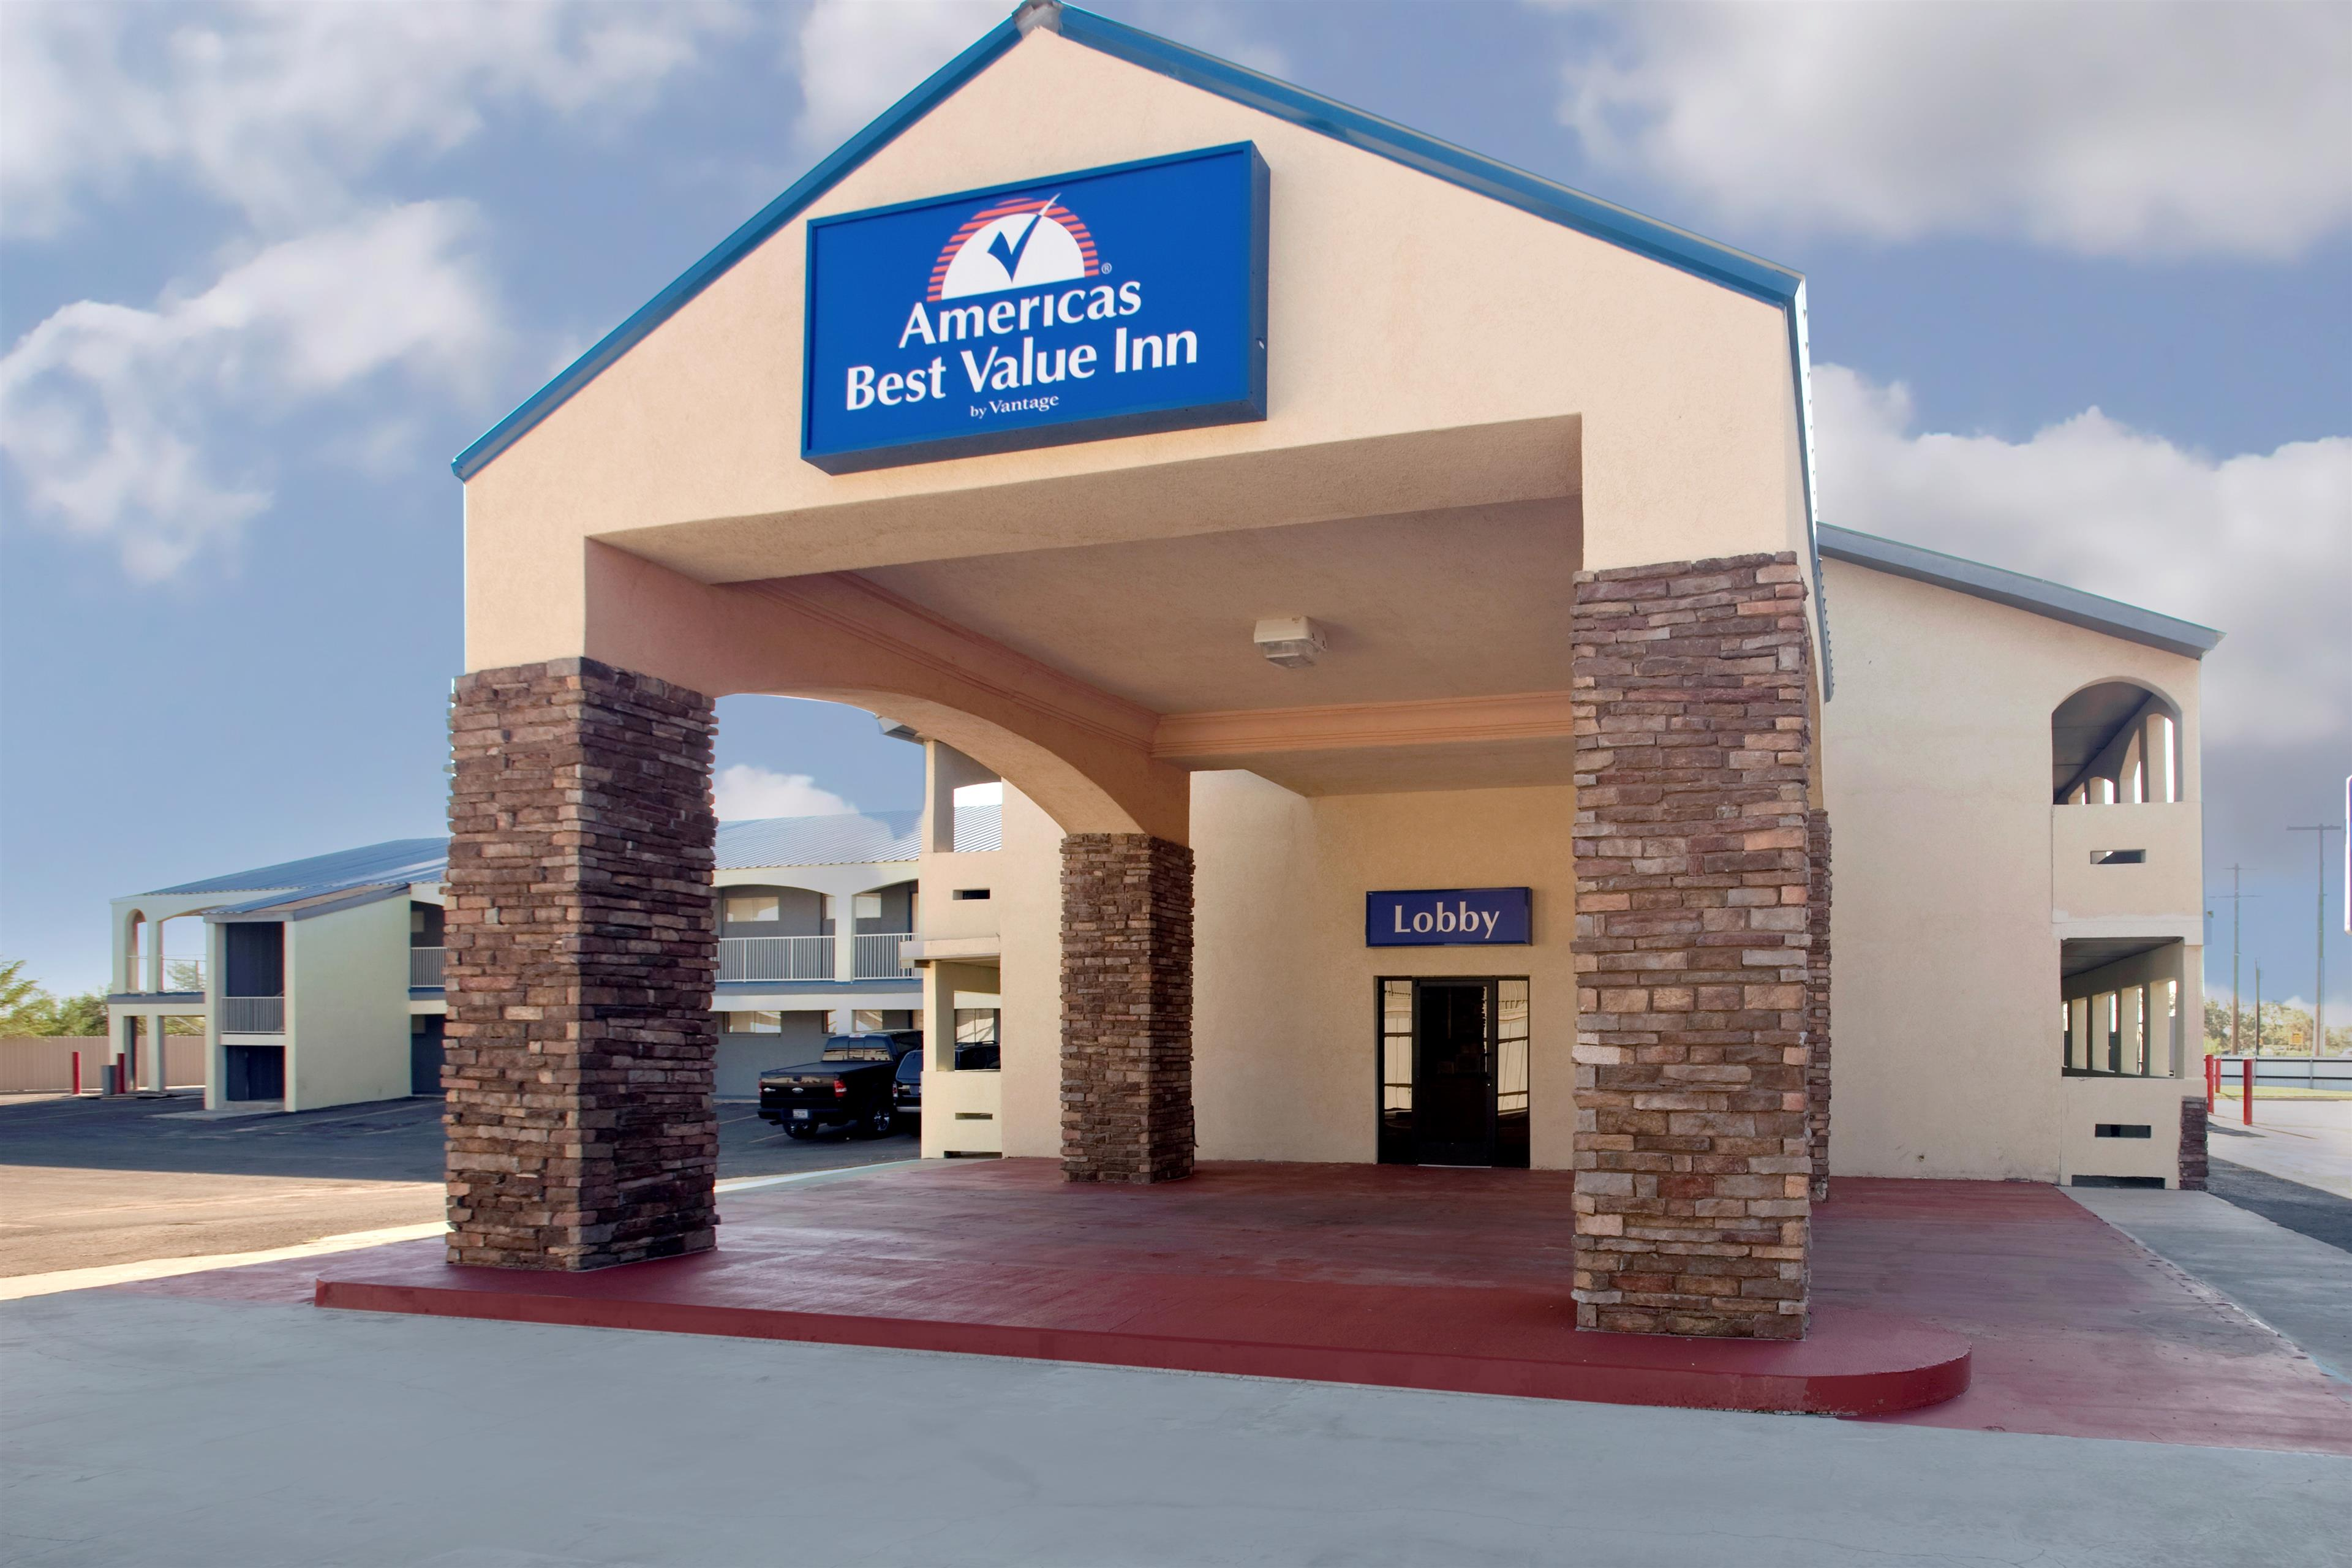 Midland Tx Hotels Motels